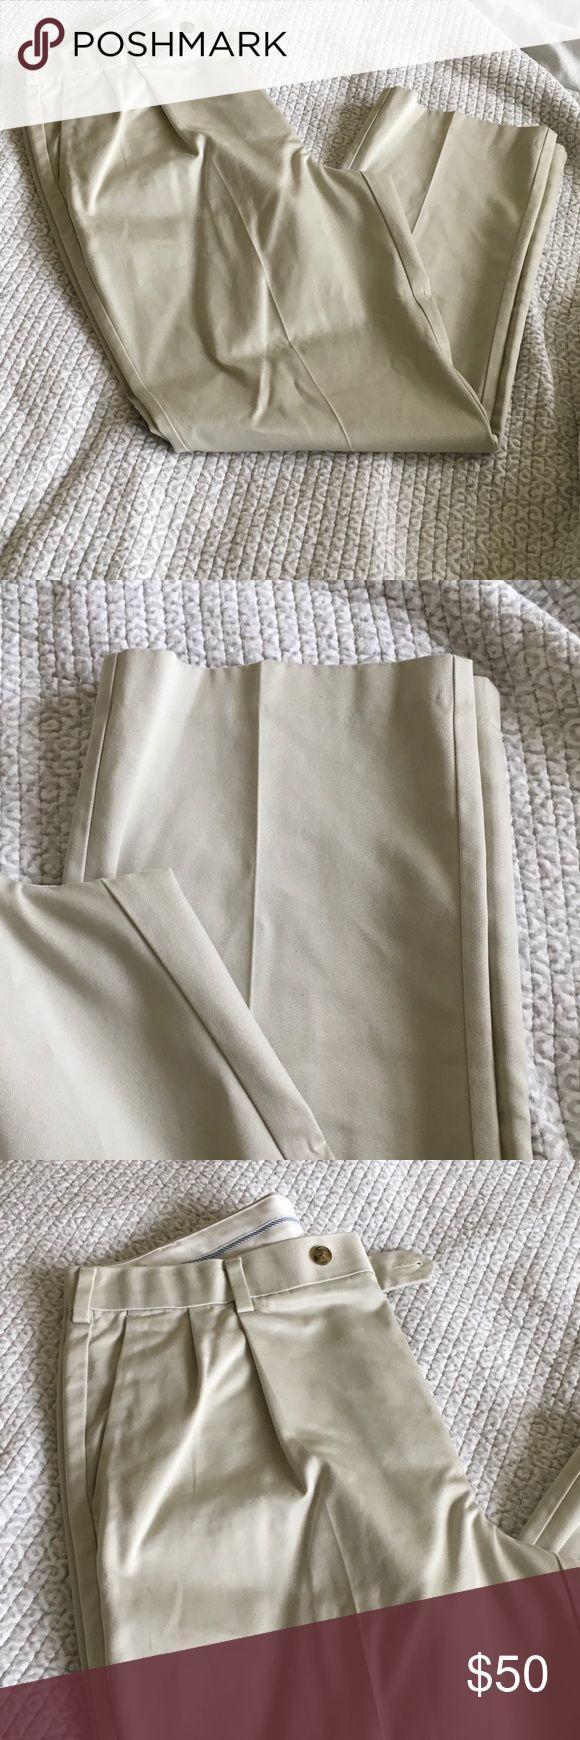 Men's Slacks Roundtree & Yorke Men's Cream Colored Pleated Slacks, size 36x30 Roundtree & Yorke Pants